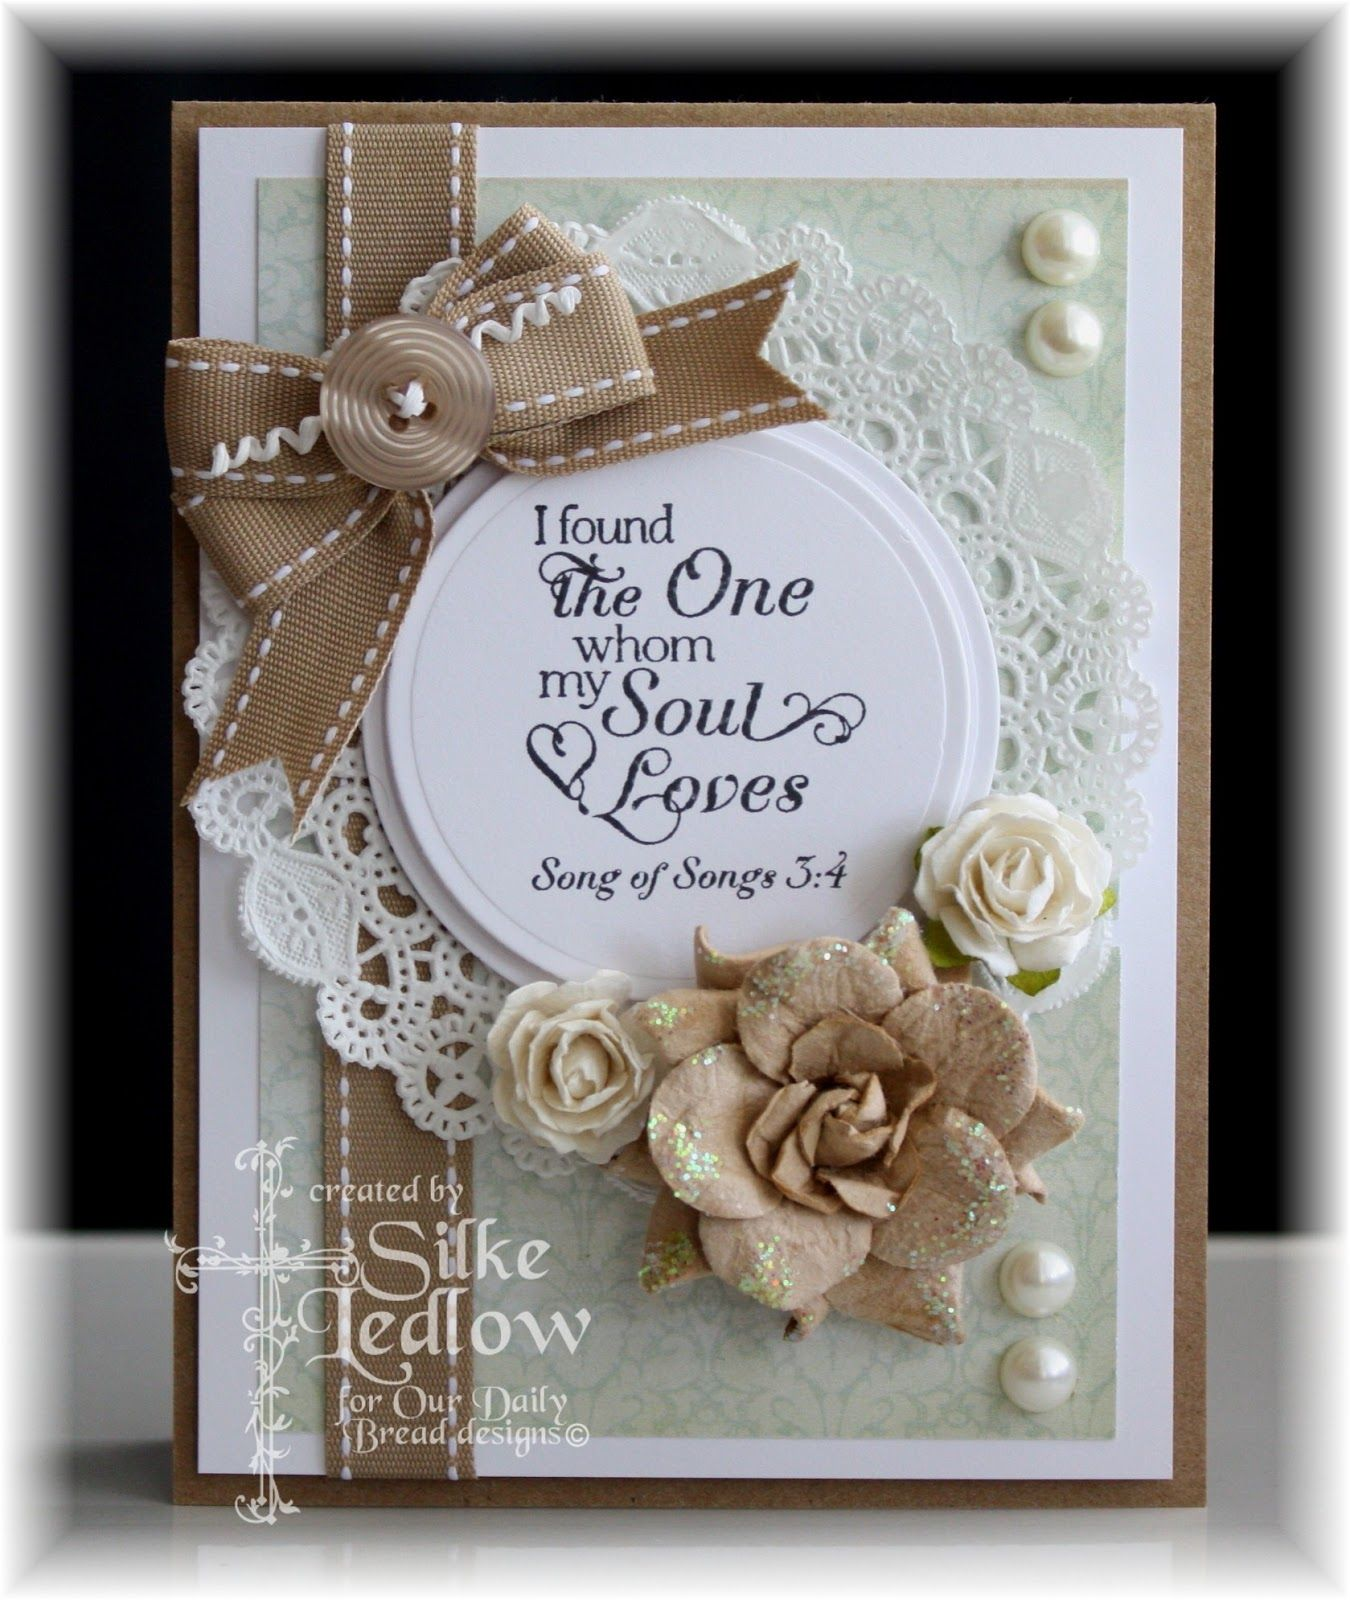 Very nice card